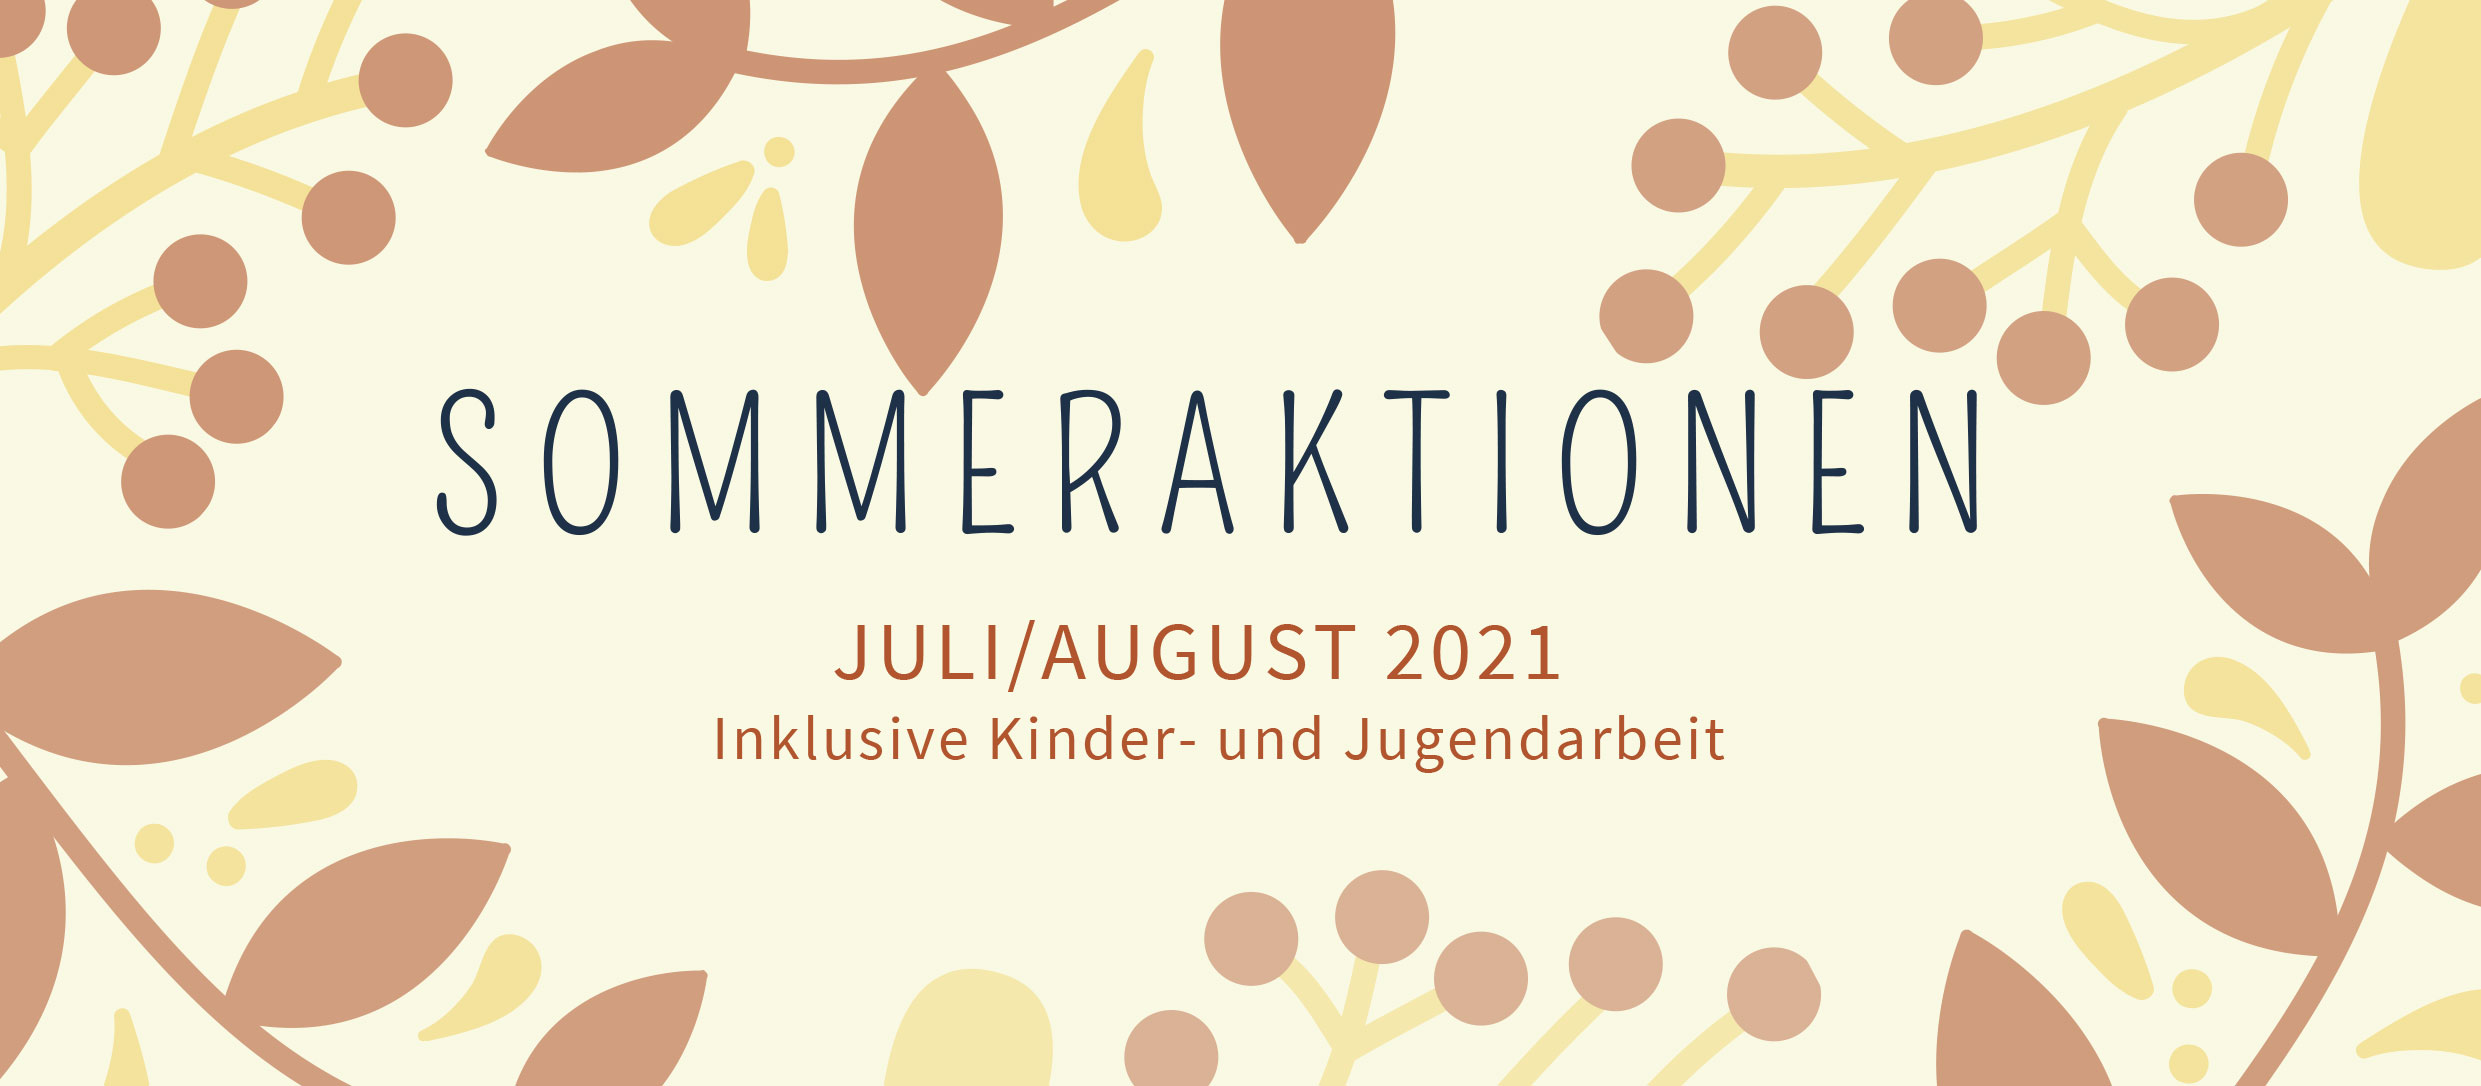 Sommeraktionen KiK Juli/August 2021